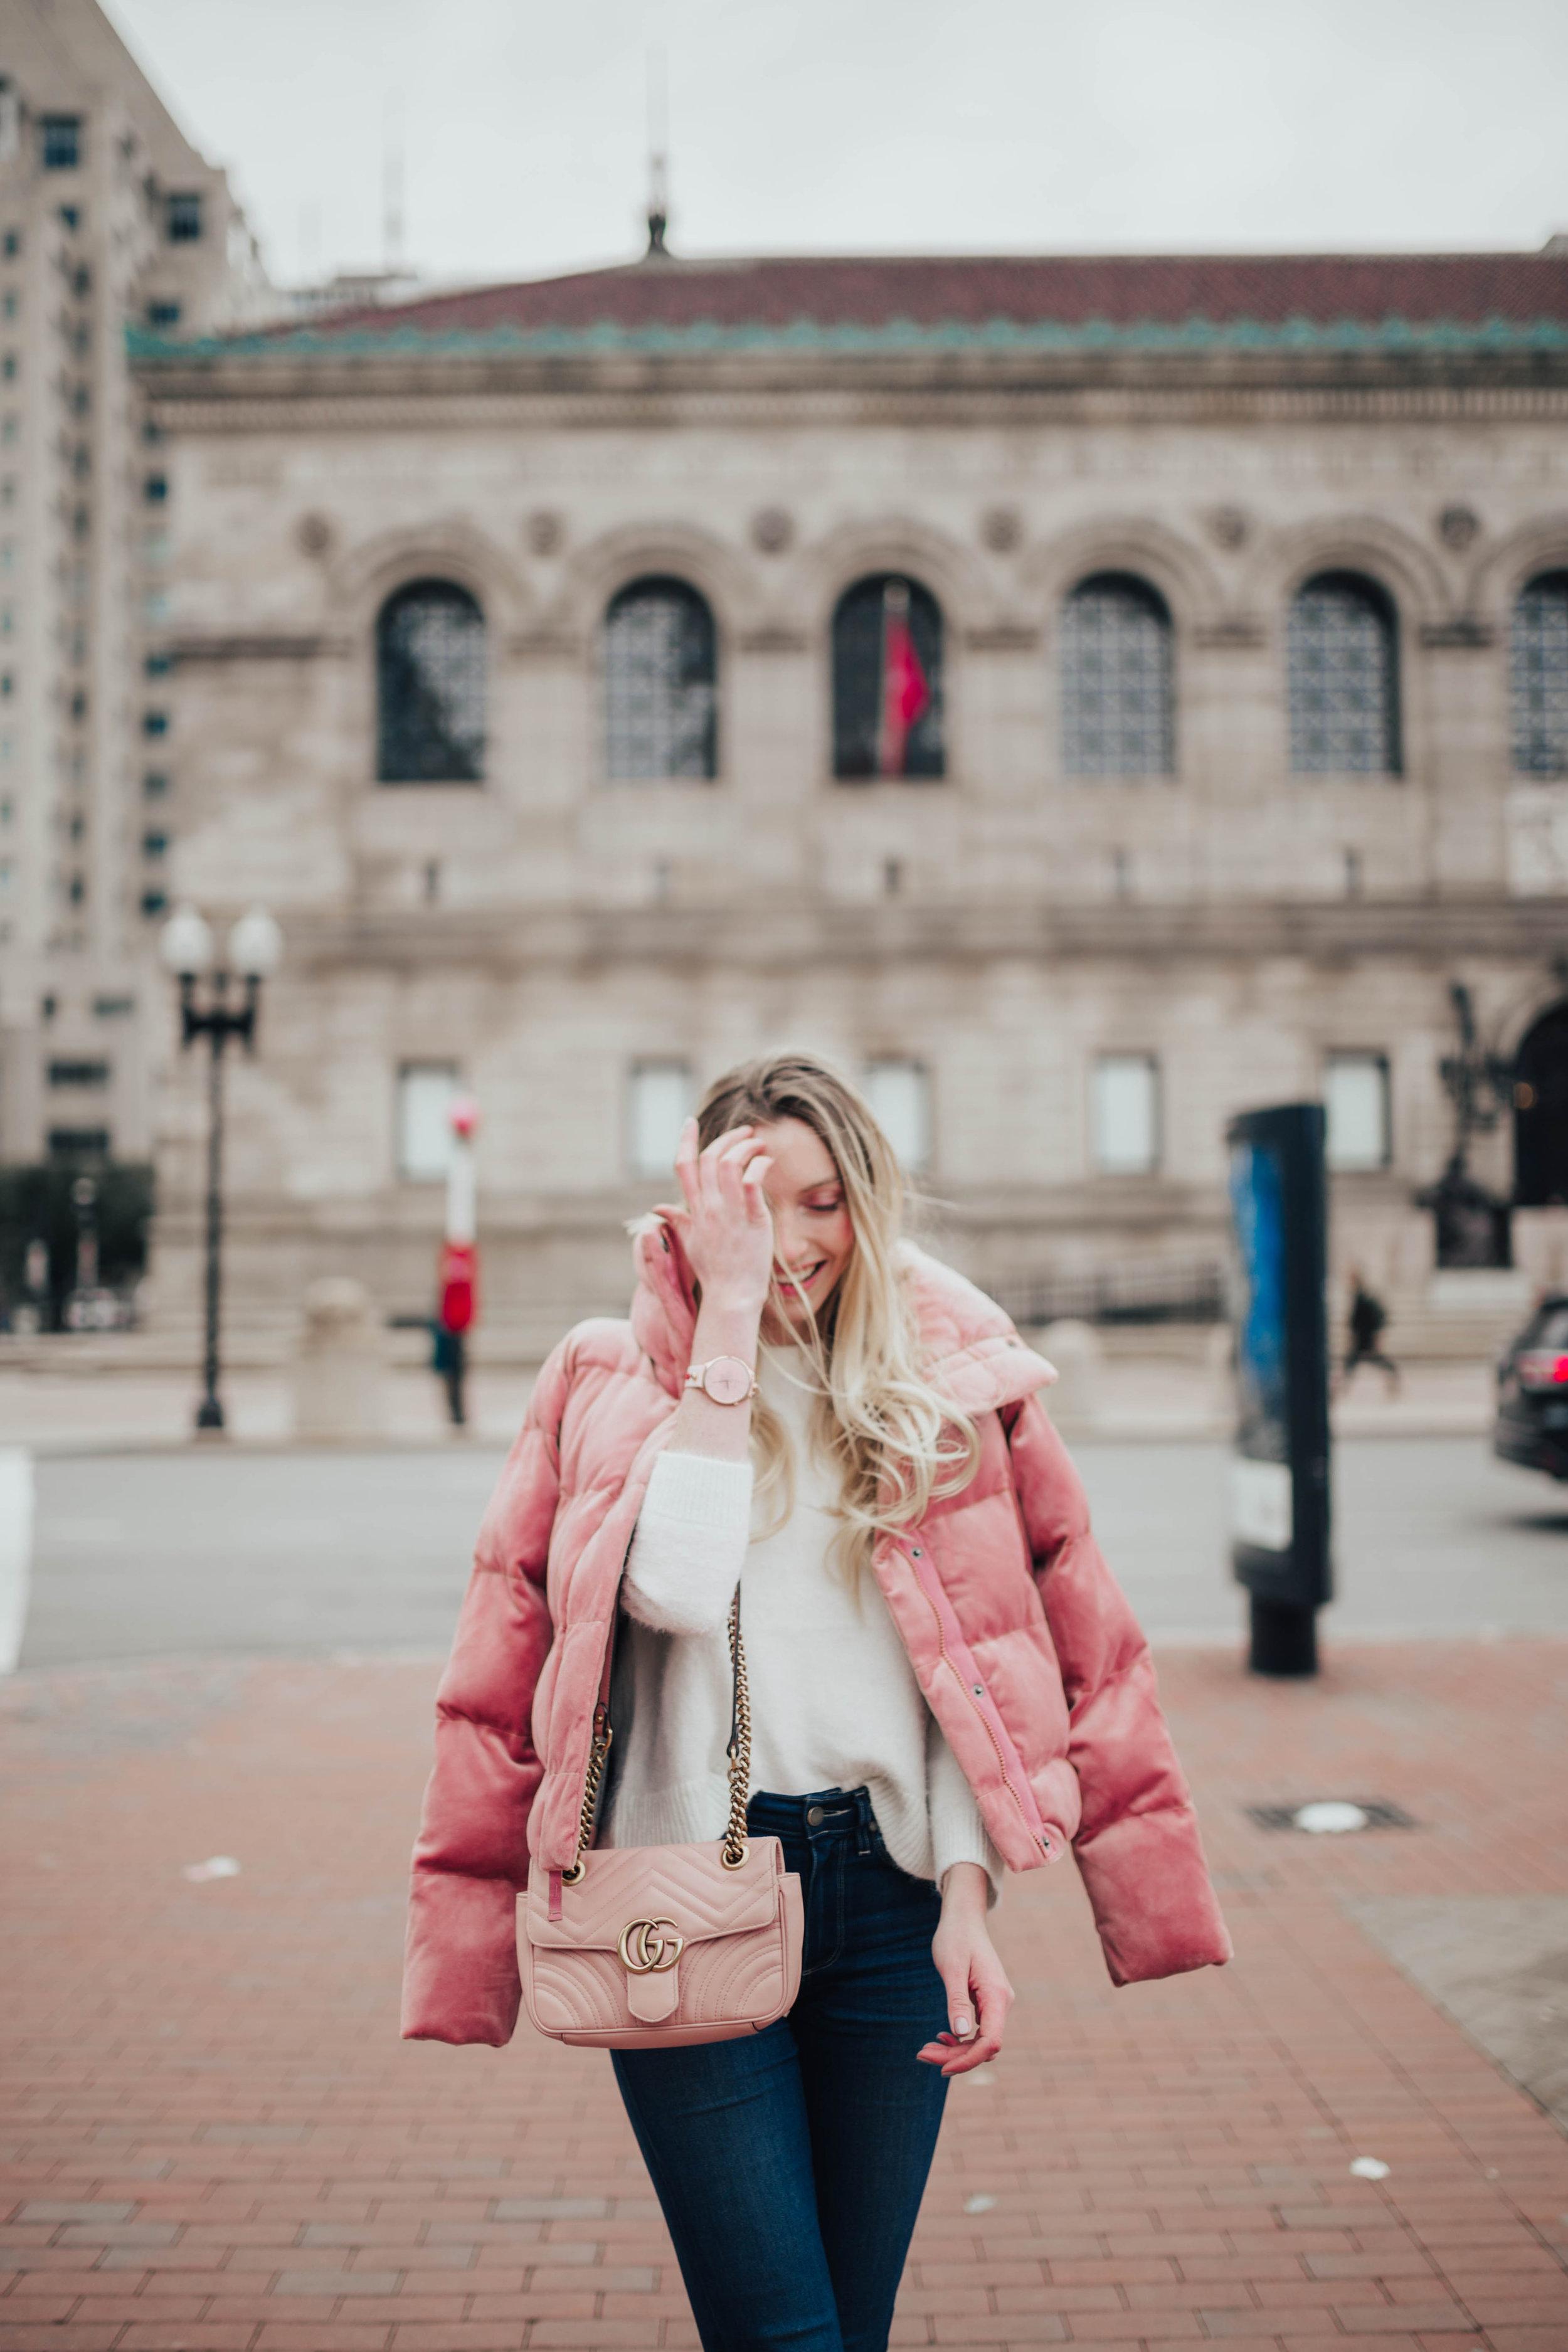 Pink Abercrombie Puffer (via @maevestier)